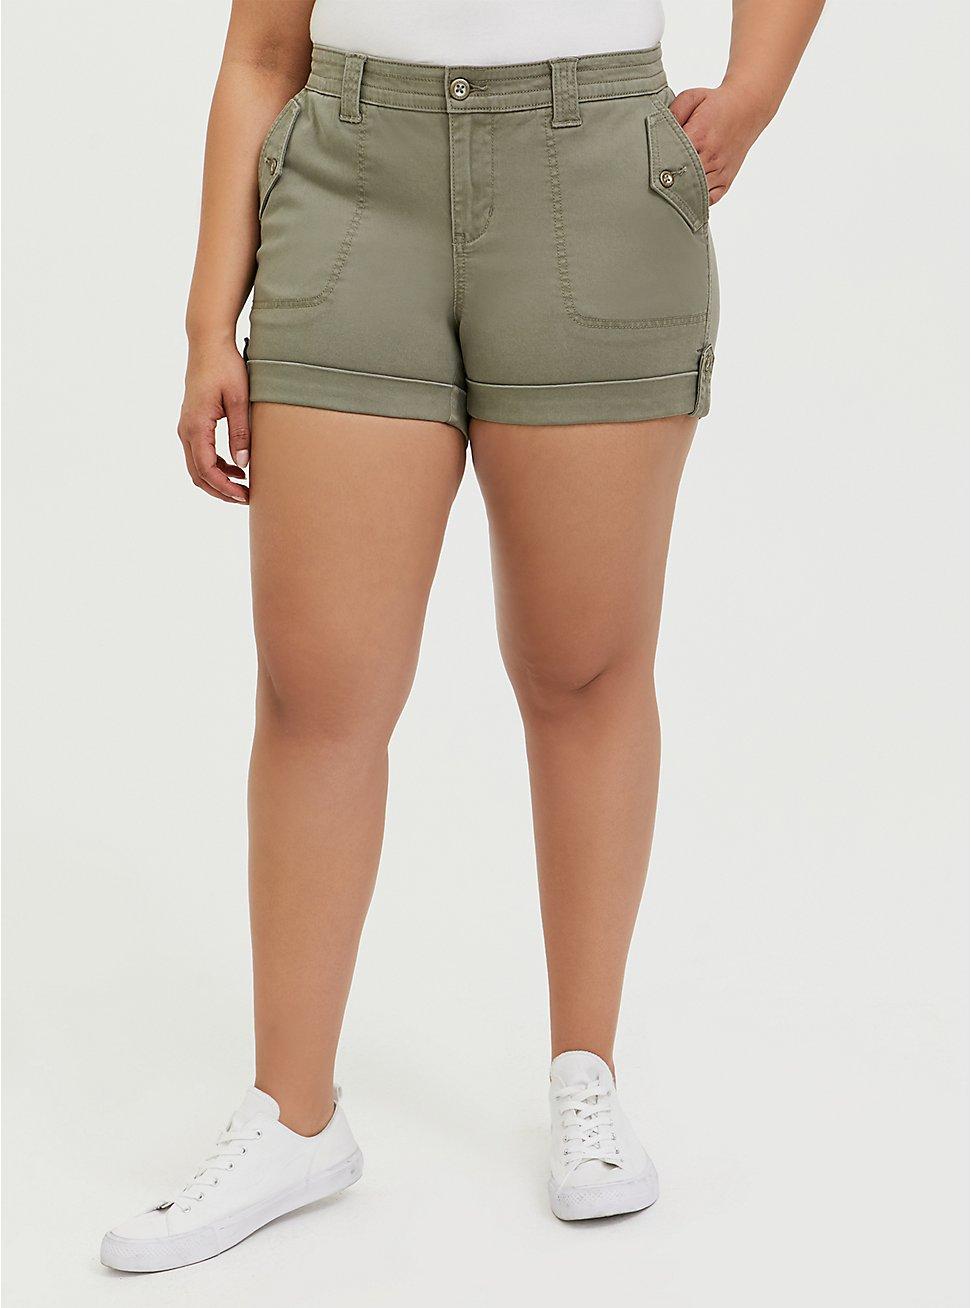 Military Short Short - Twill Light Olive Green, VETIVER, hi-res